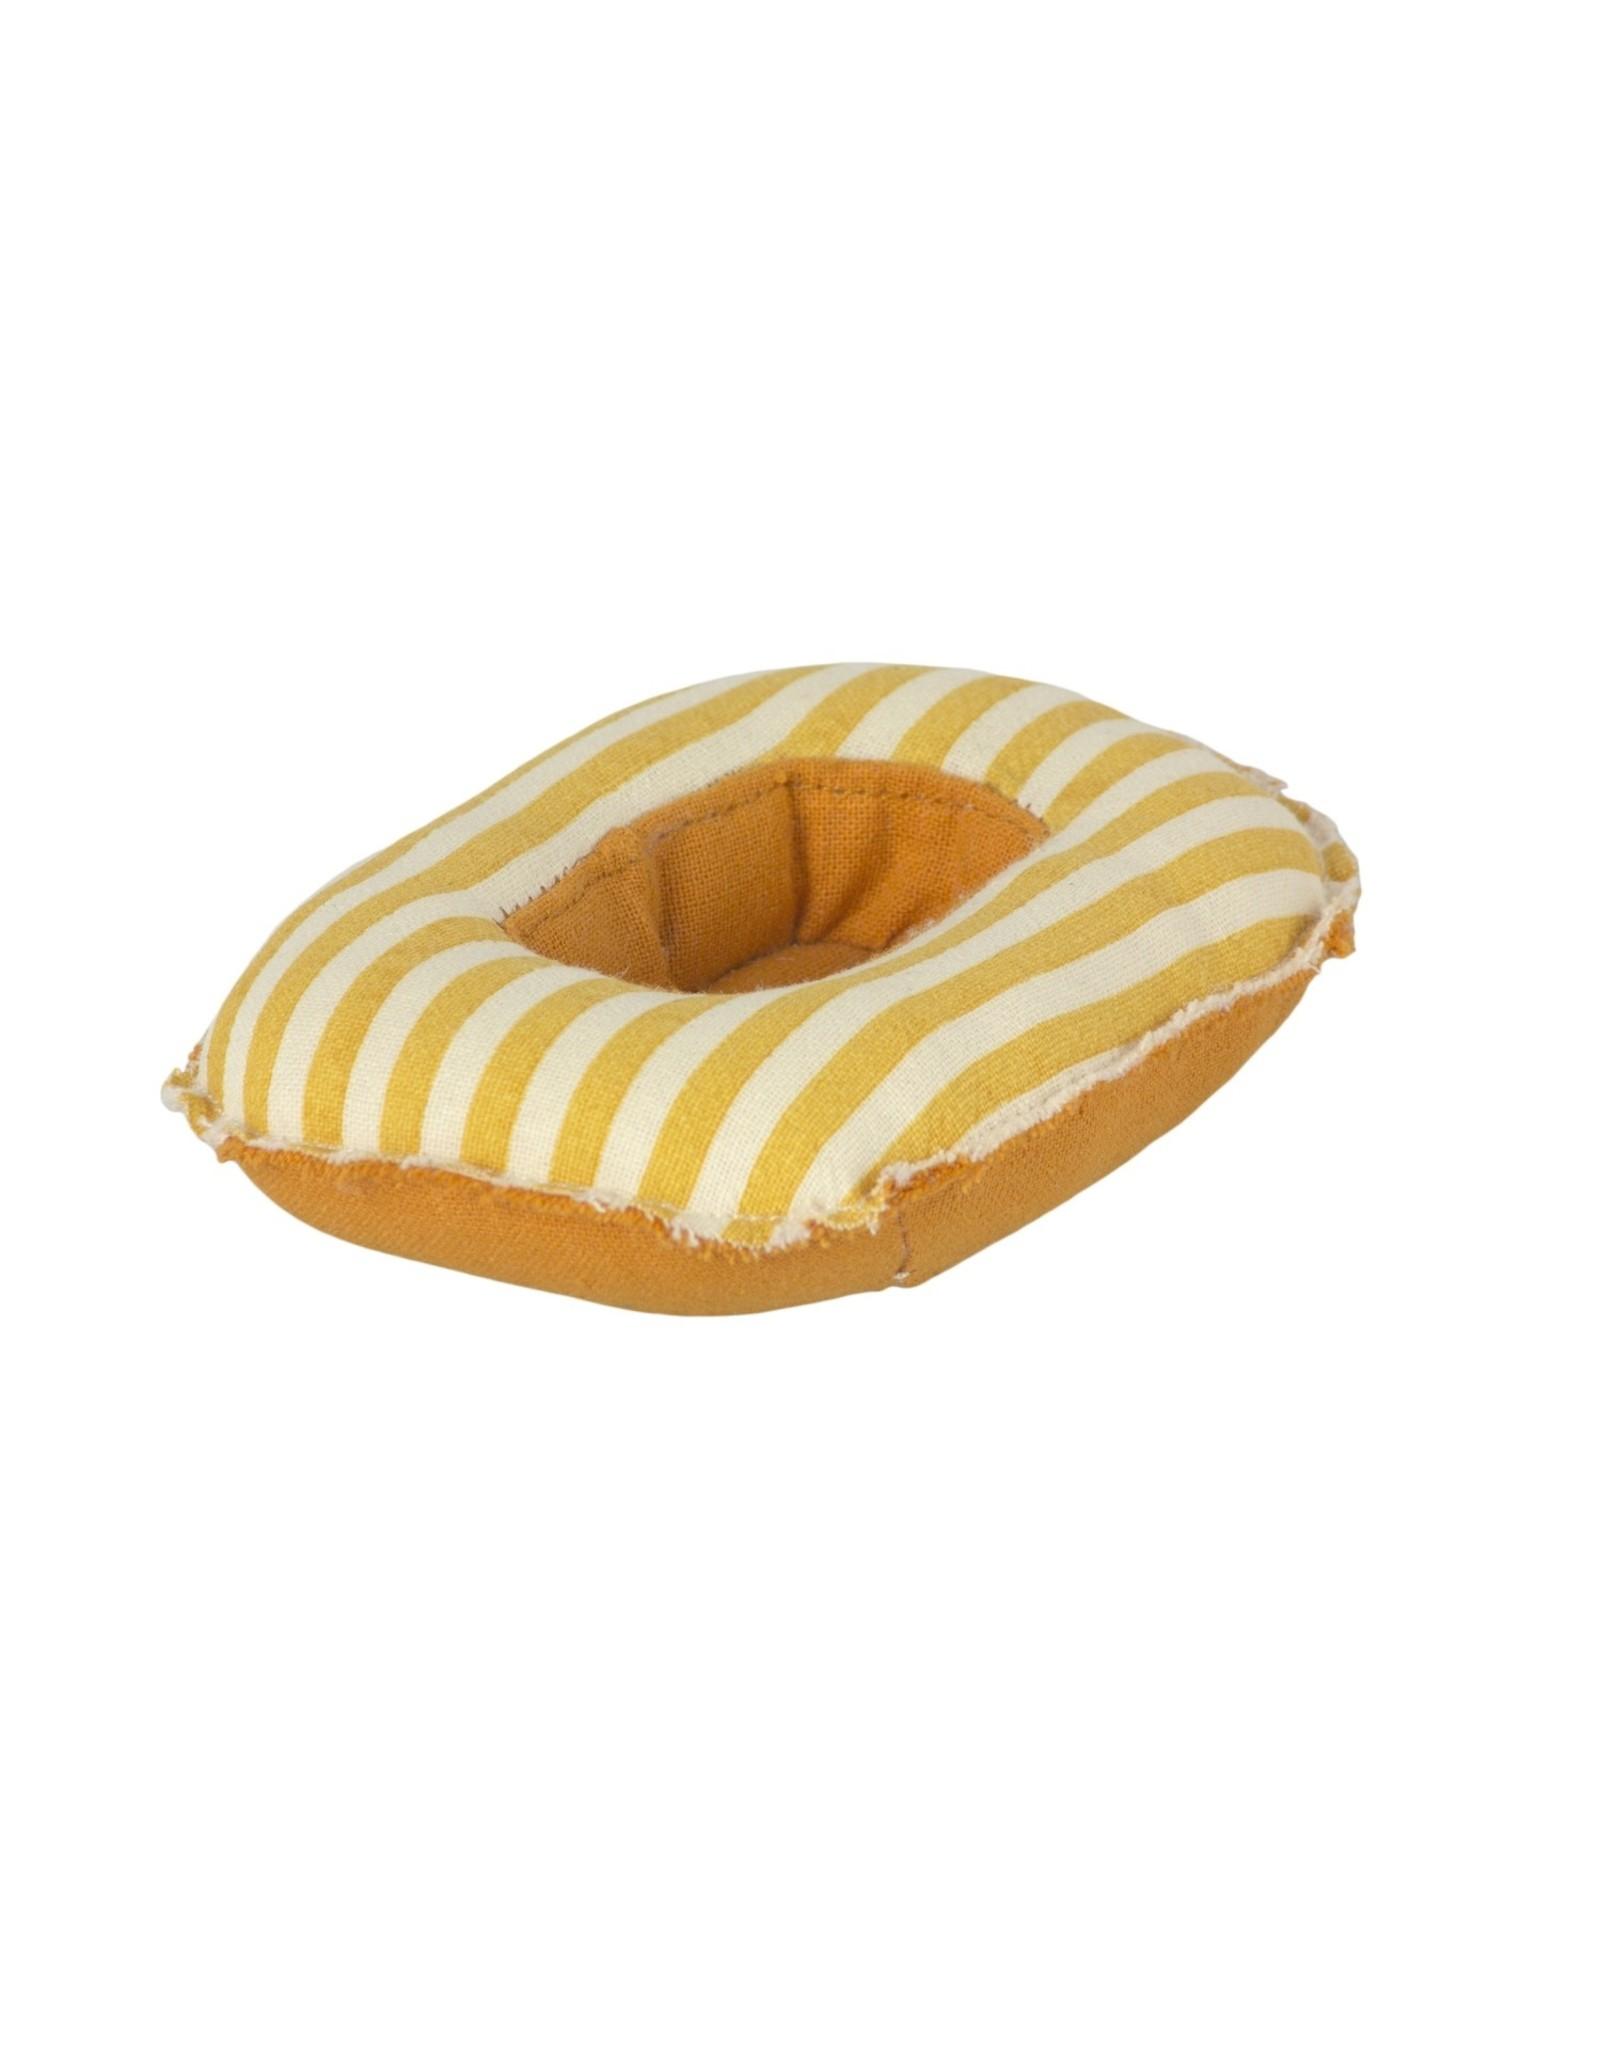 Maileg Rubberboot Small Yellow